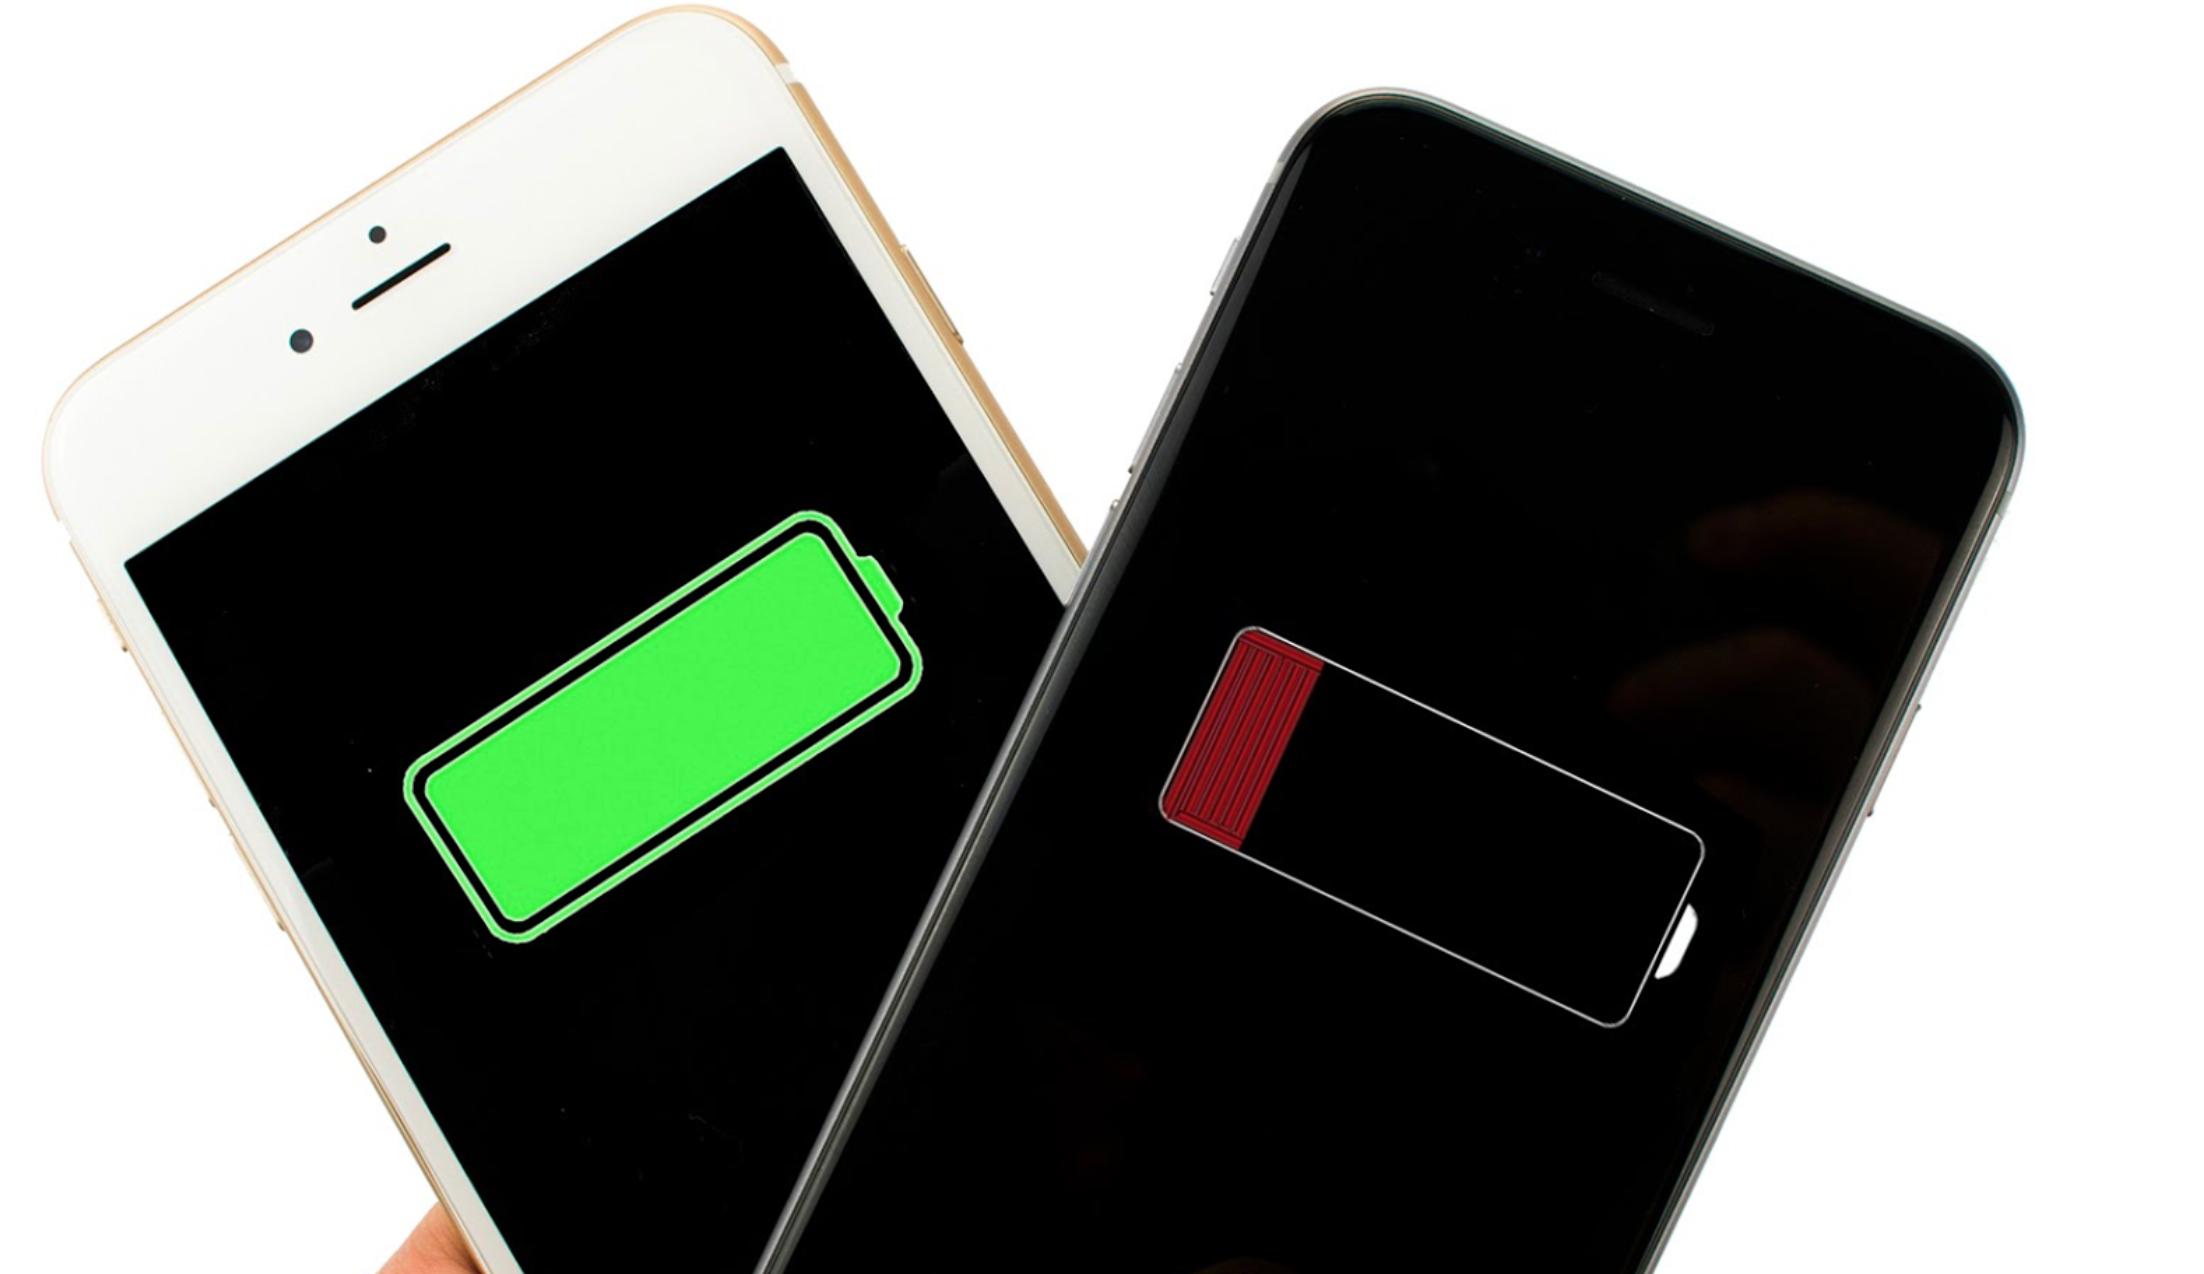 Не работает зарядка iPhone 6 Plus